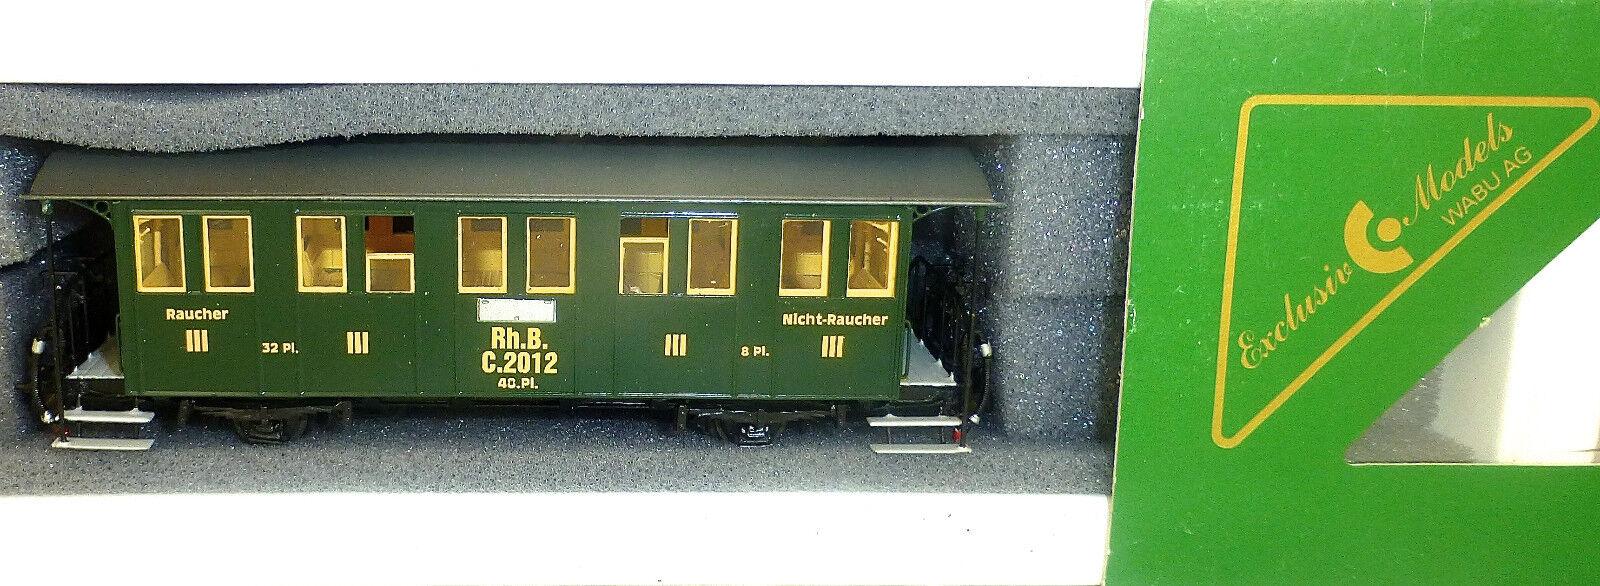 Rhb Steam Train Oldtimer 3rd Kl 2012 Exclusive Models Wabu 265.005 H0m Sealed